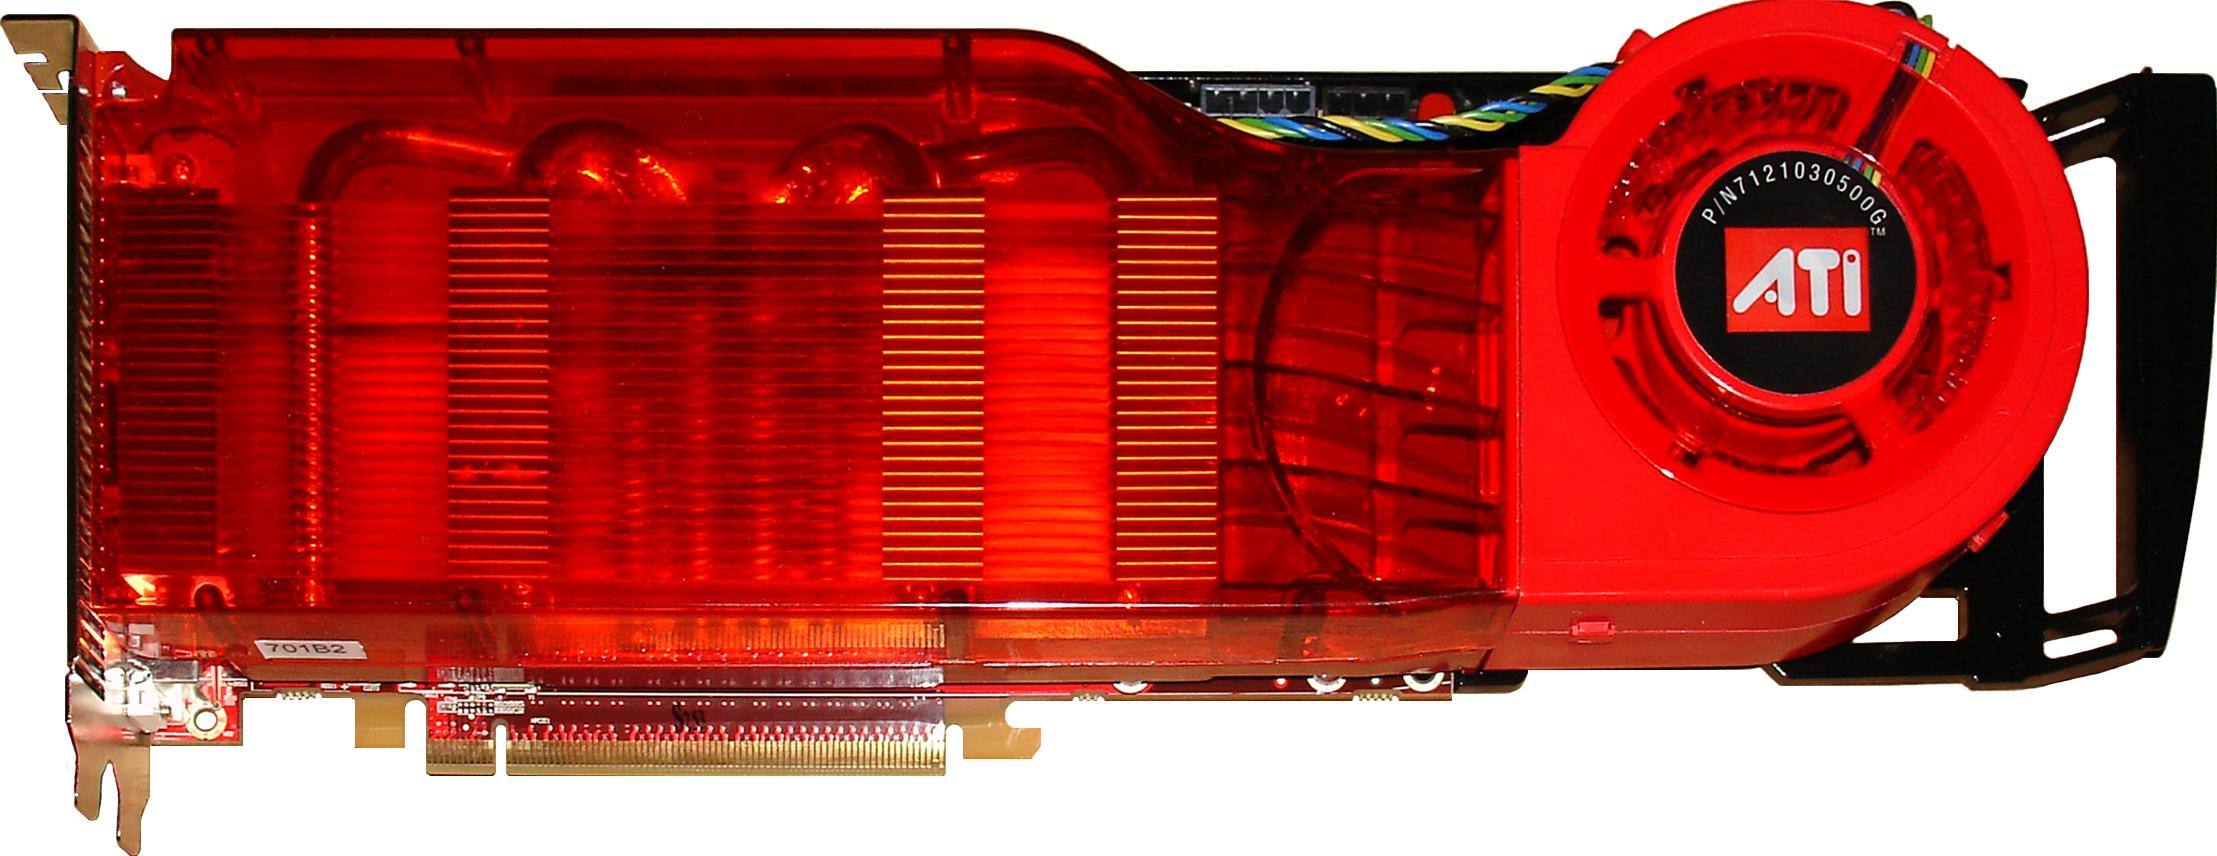 ATi Radeon HD 2900 XTX 1024MB GDDR4 512Bit Rev_A1 0704 Prototype top (1).JPG